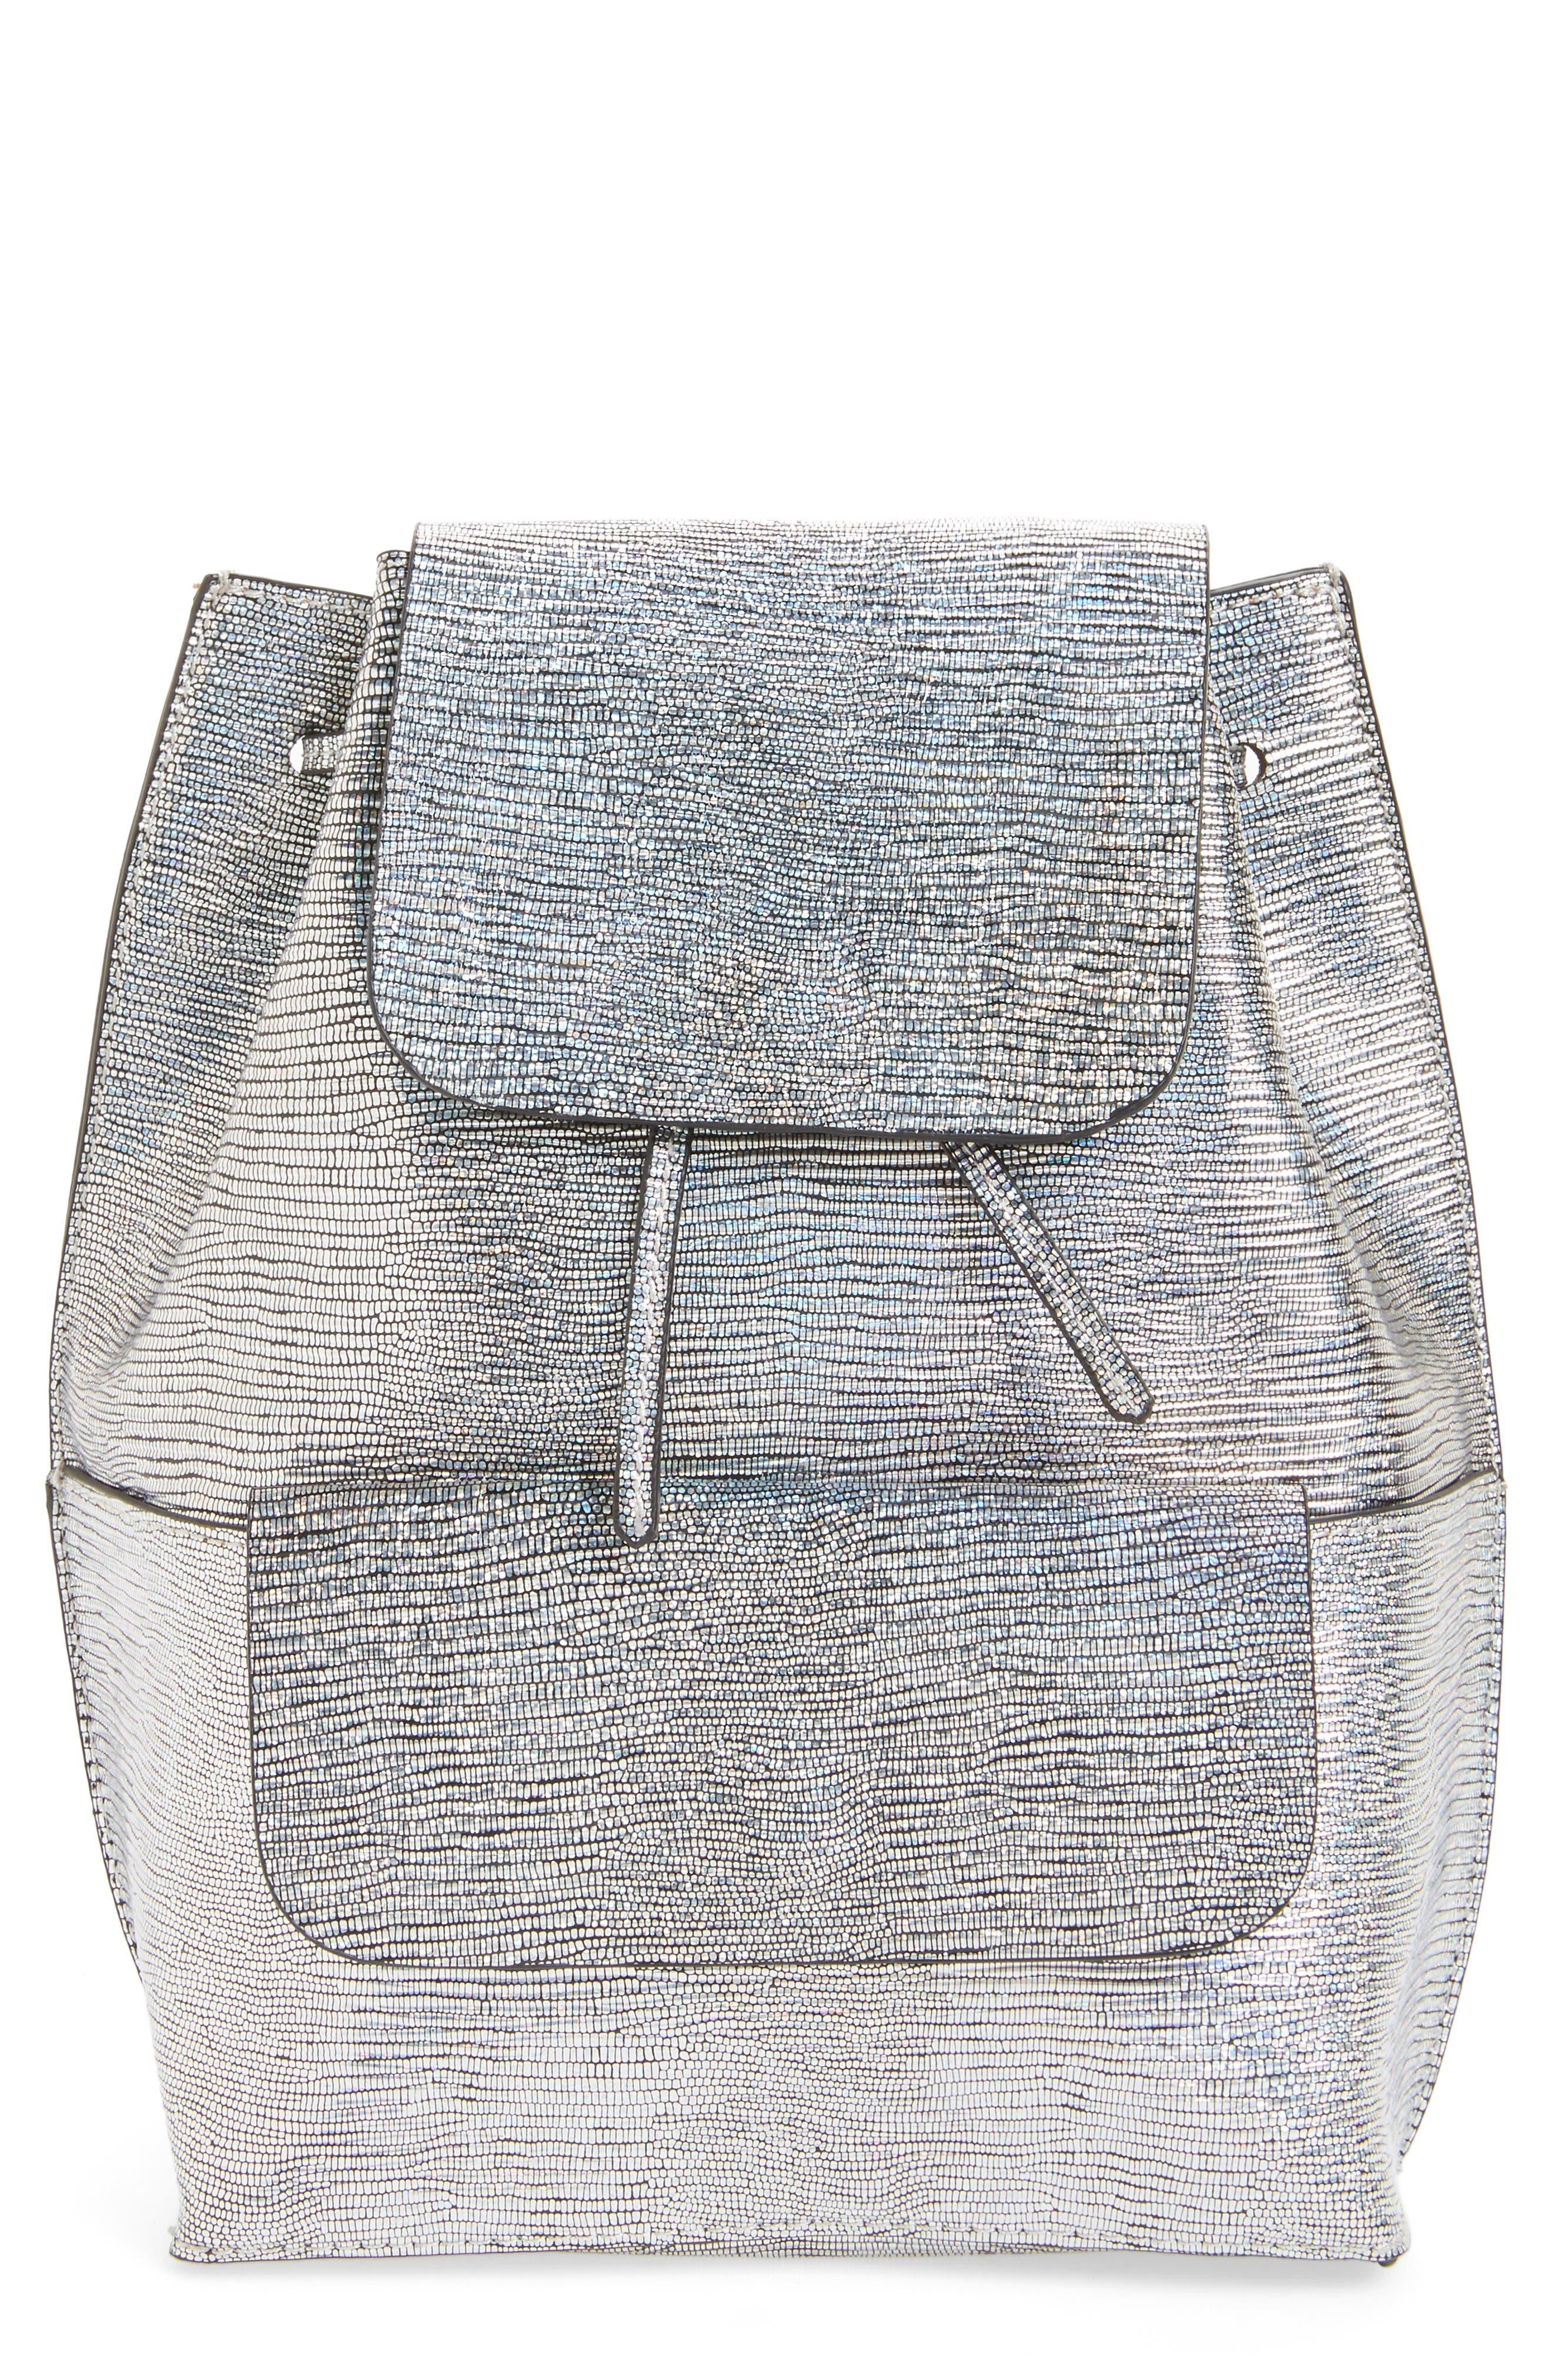 Main Image - Street Level Flap Pocket Backpack